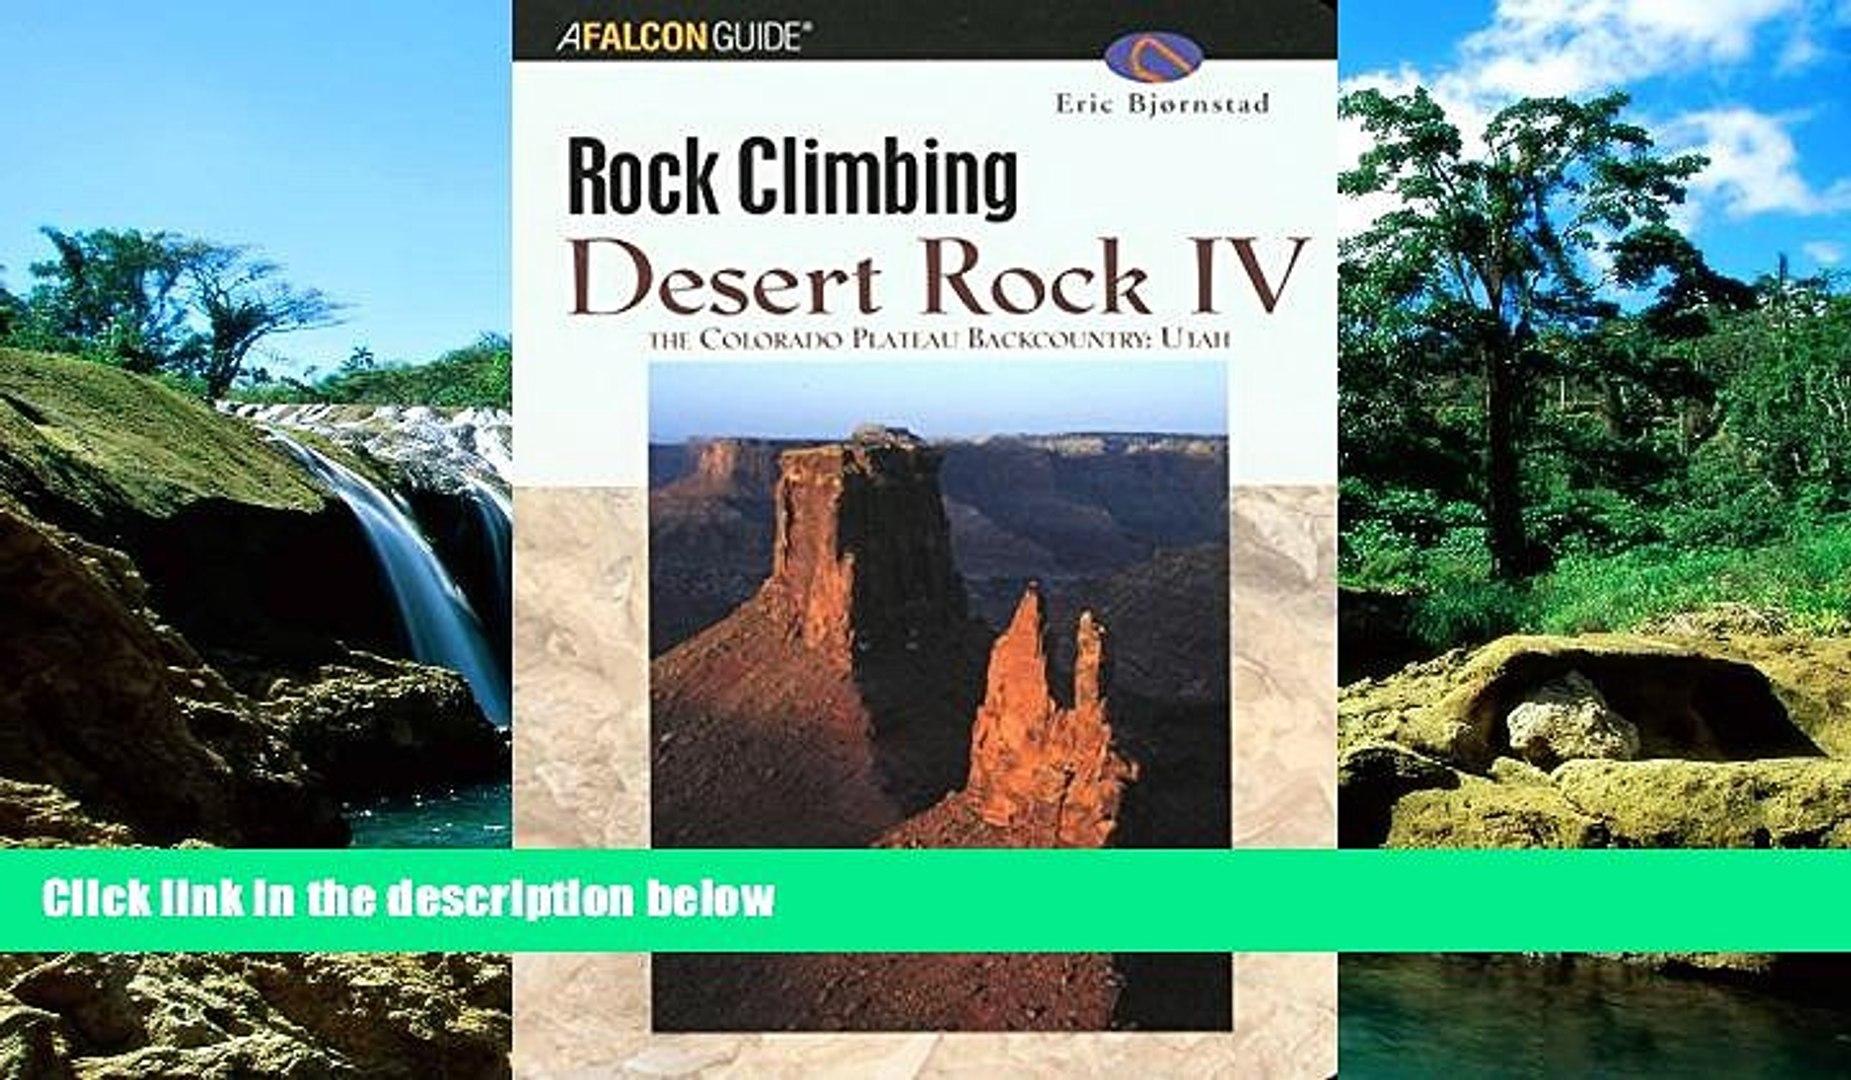 READ FULL  Rock Climbing Desert Rock IV: The Colorado Plateau Backcountry: Utah (Regional Rock